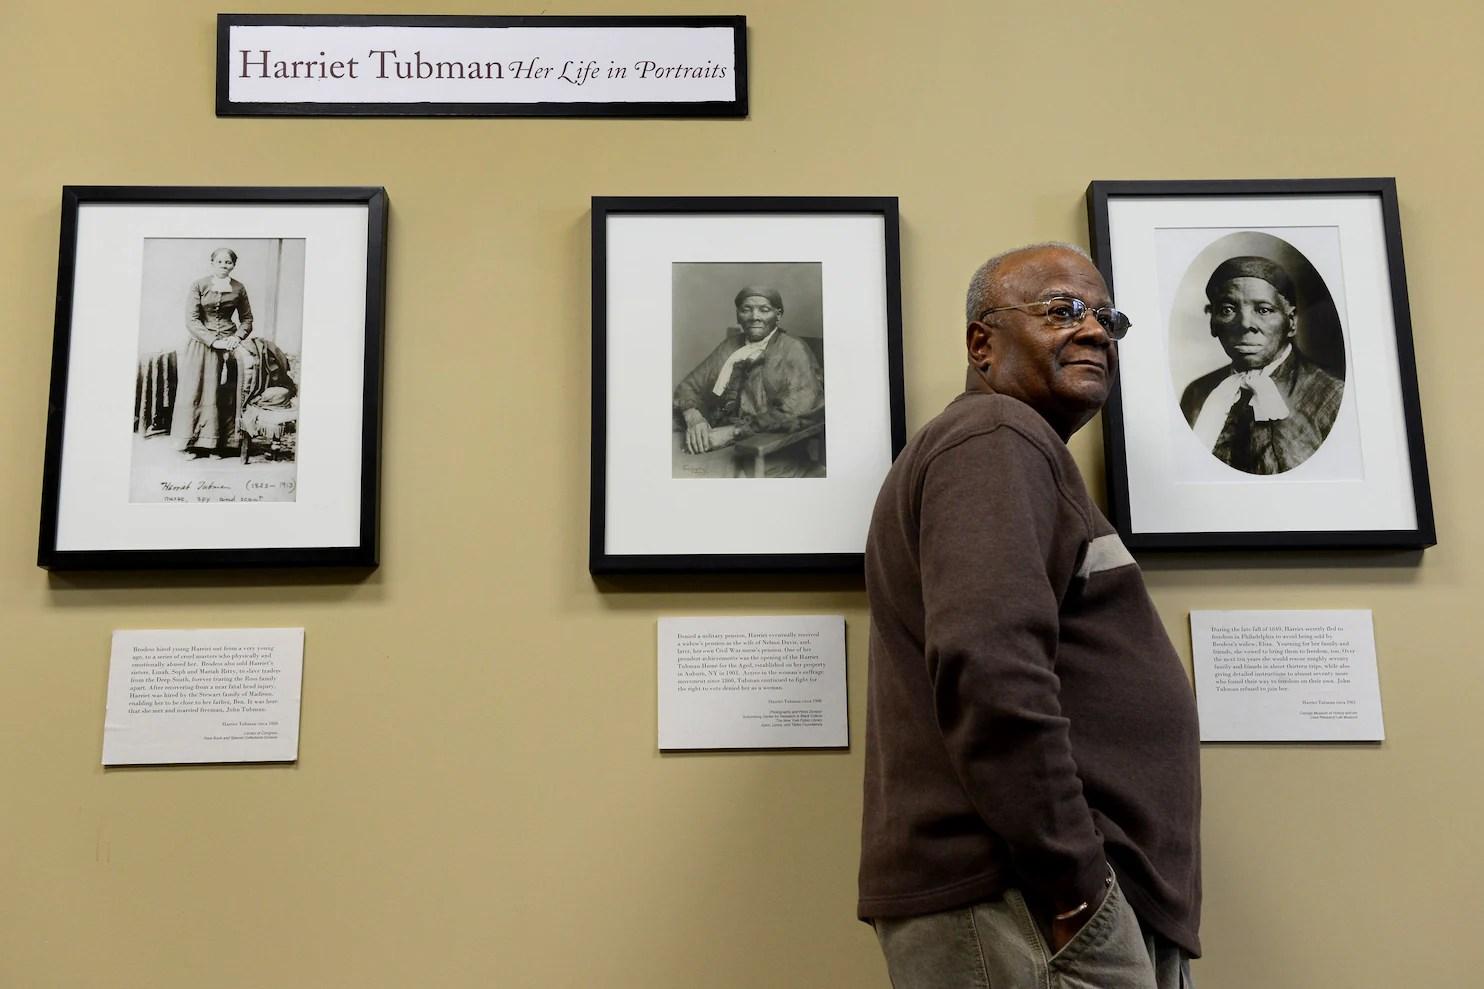 medium resolution of A century after Harriet Tubman died